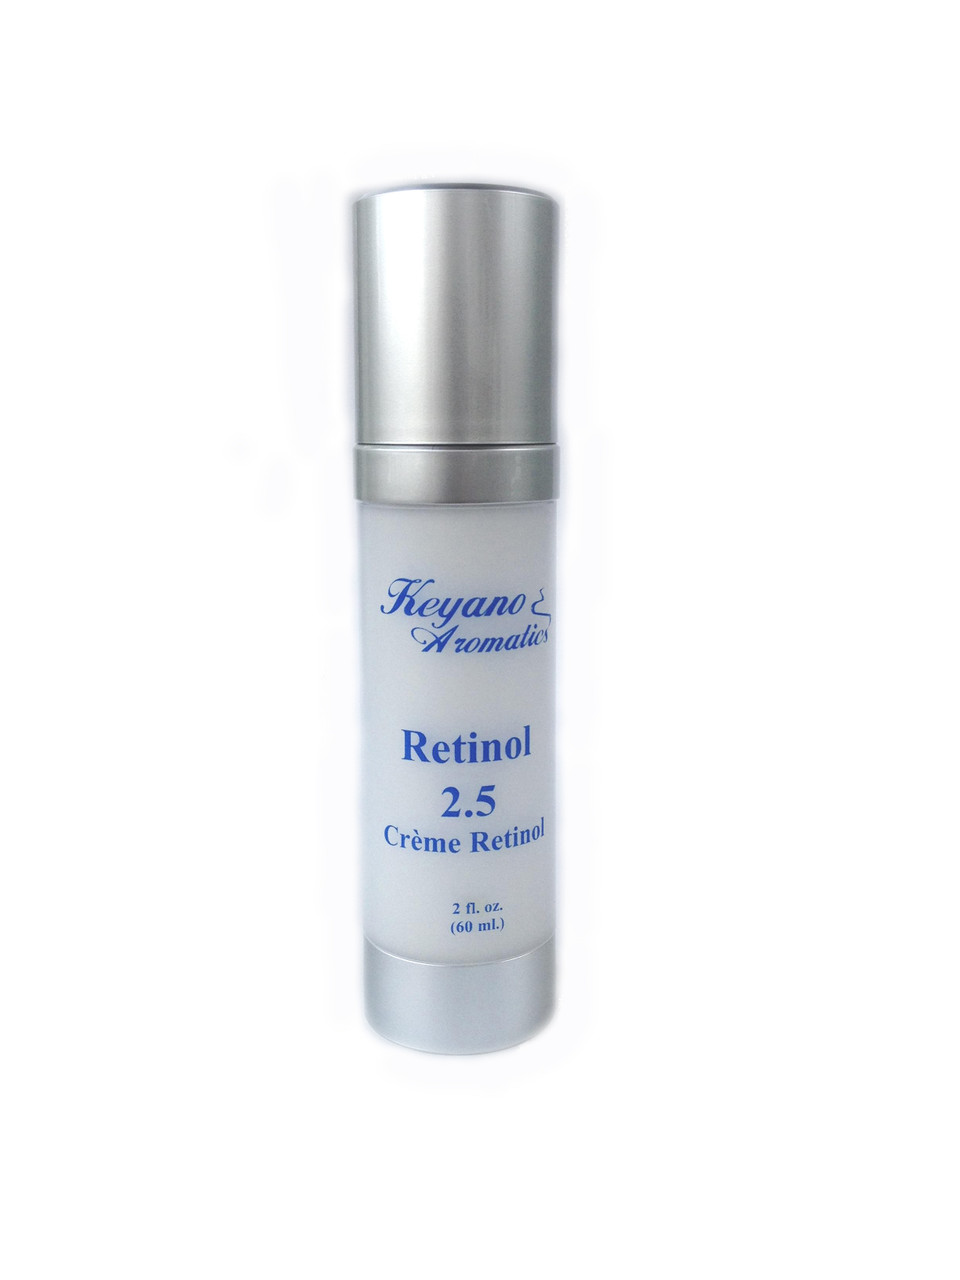 Retinol 2.5 Cream 2 oz - Kimberley's A Day Spa